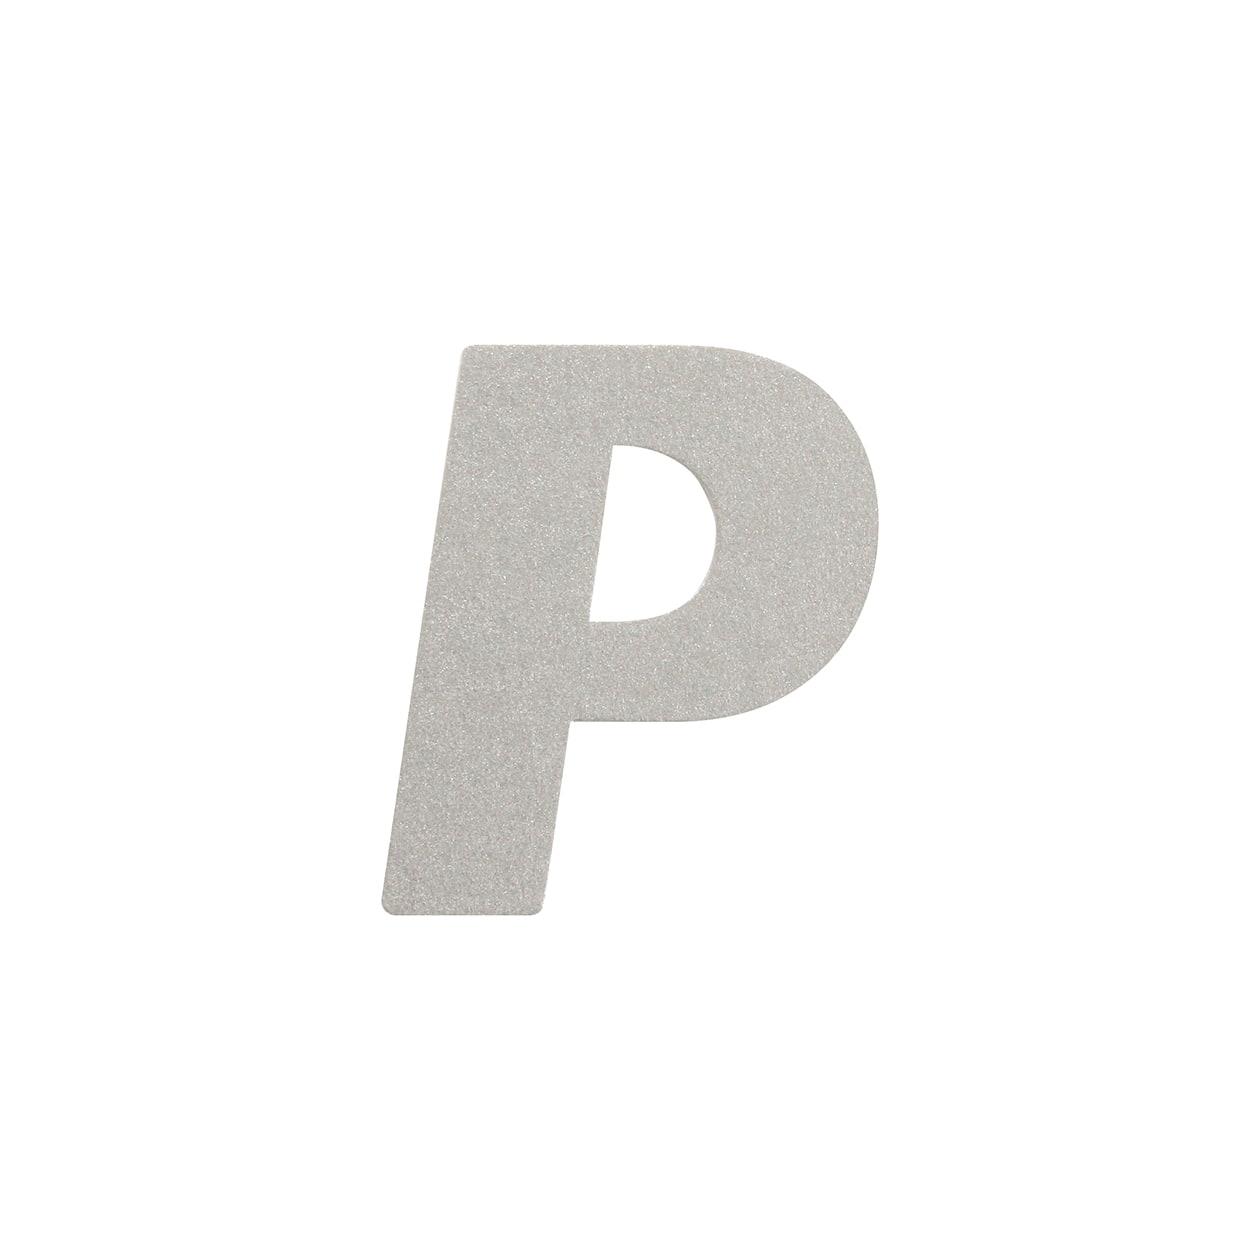 No.395ボード A7カードDC 文字P シルバー